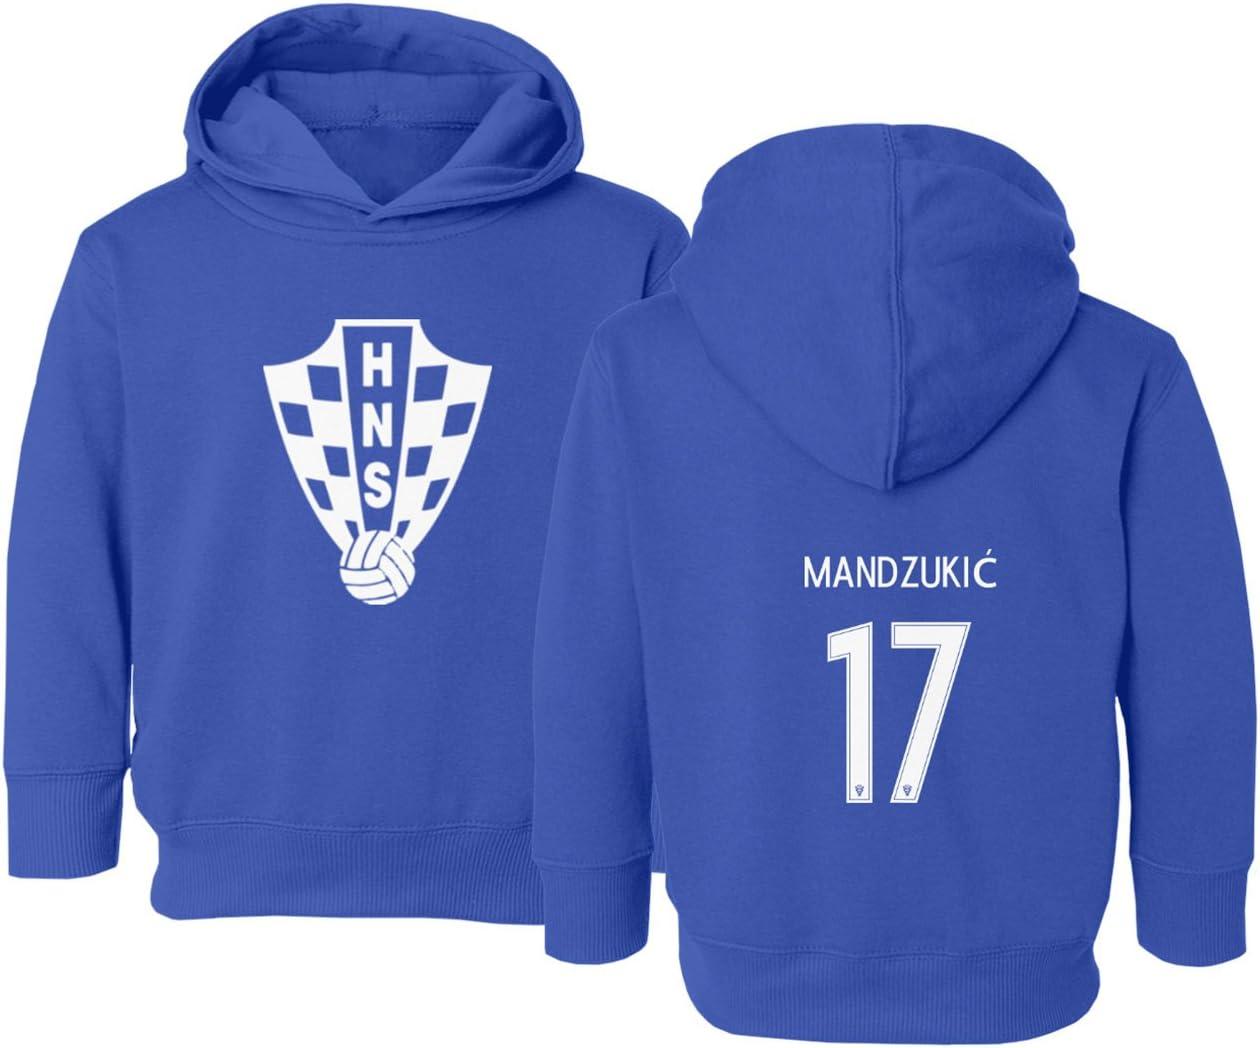 Tcamp Croatia 2018 National Soccer #17 Mario MANDZUKIC World Championship Little Kids Girls Boys Toddler Hooded Sweatshirt